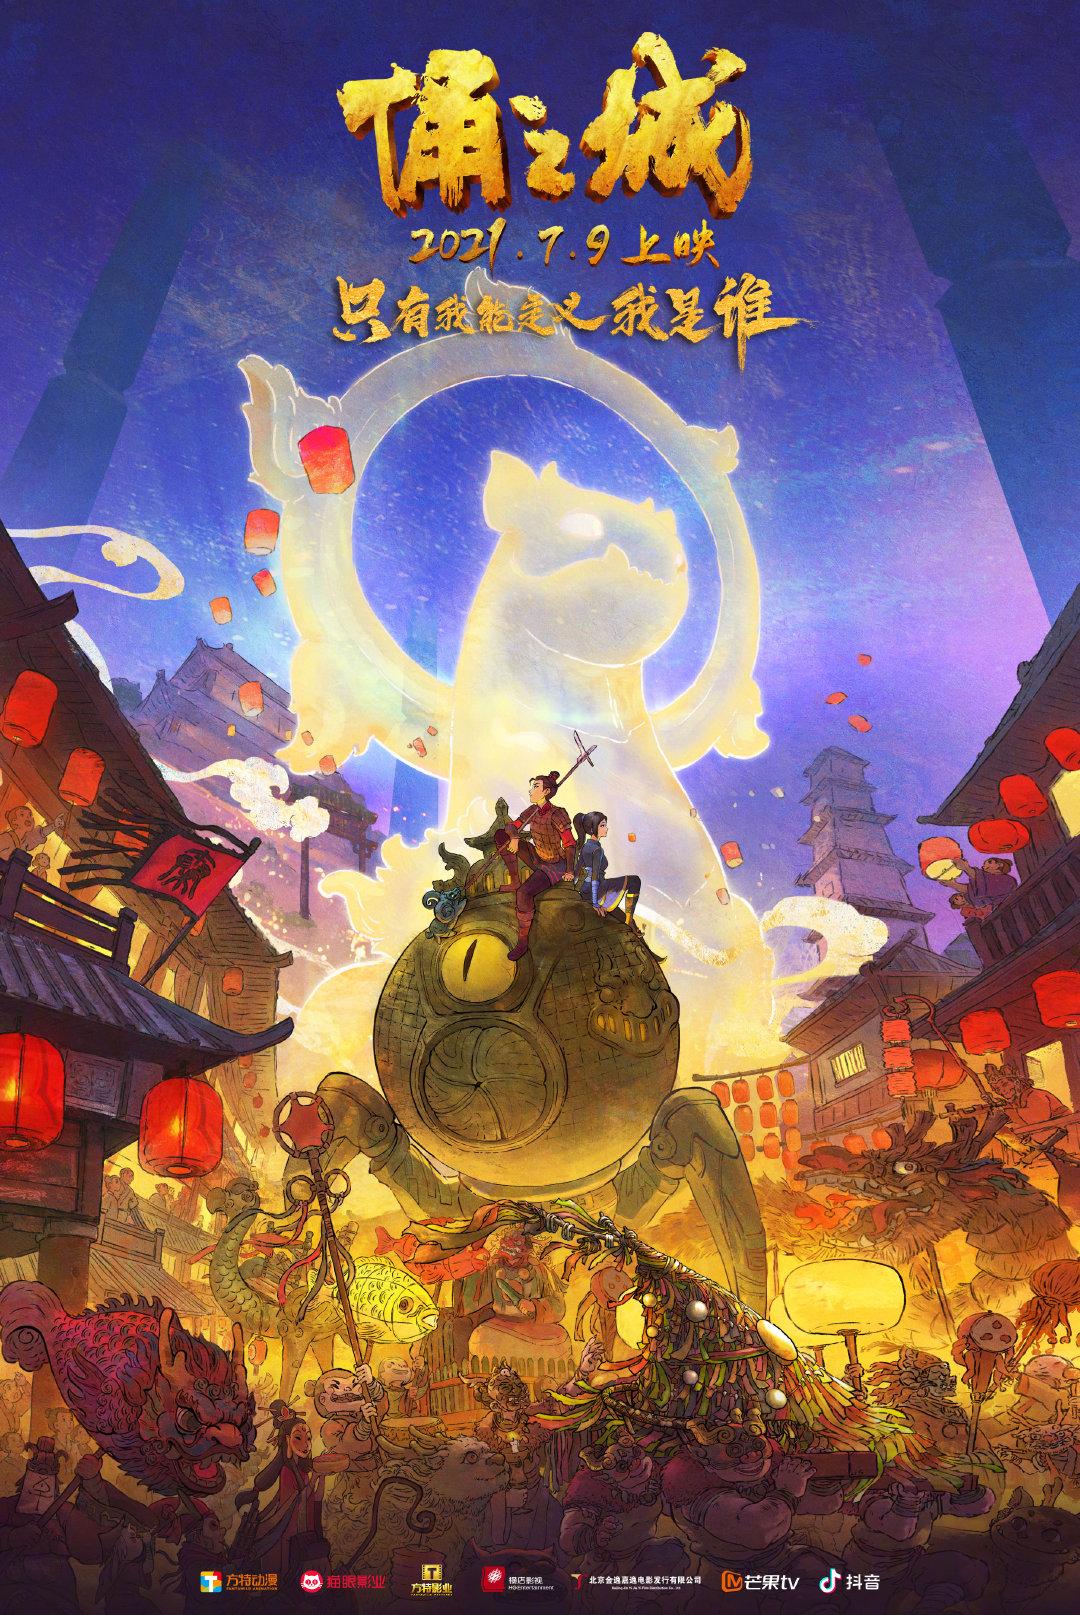 3d动画制作《俑之城》曝终极预告 7月9日上映